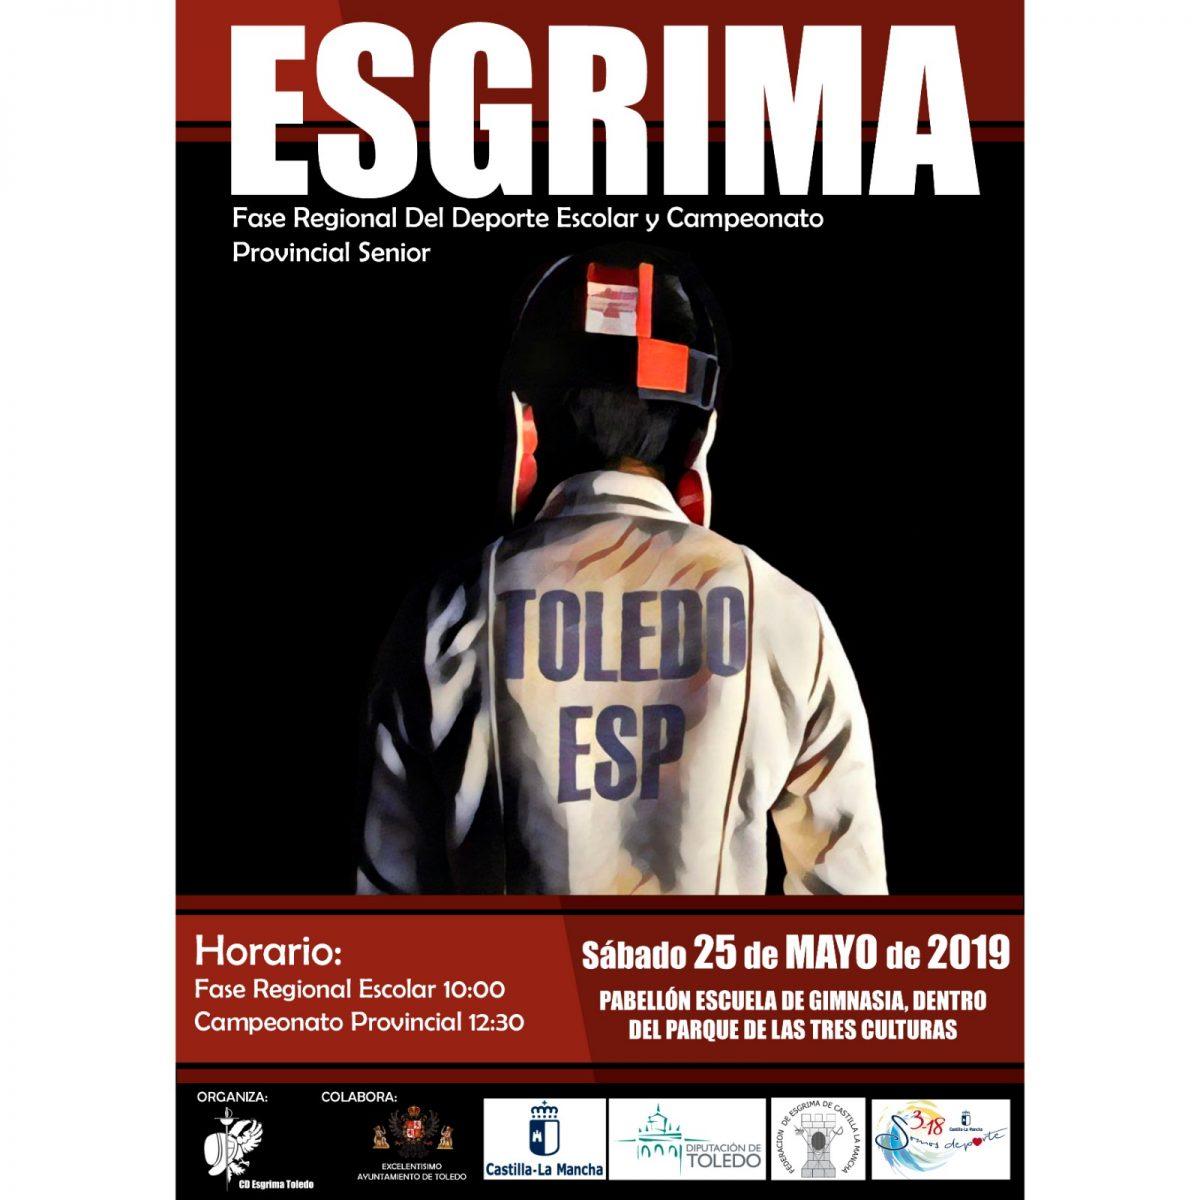 http://www.toledo.es/wp-content/uploads/2019/05/img-20190520-wa0006-1200x1200.jpg. Fase Regional Escolar y Campeonato Provincial Senior de Esgrima